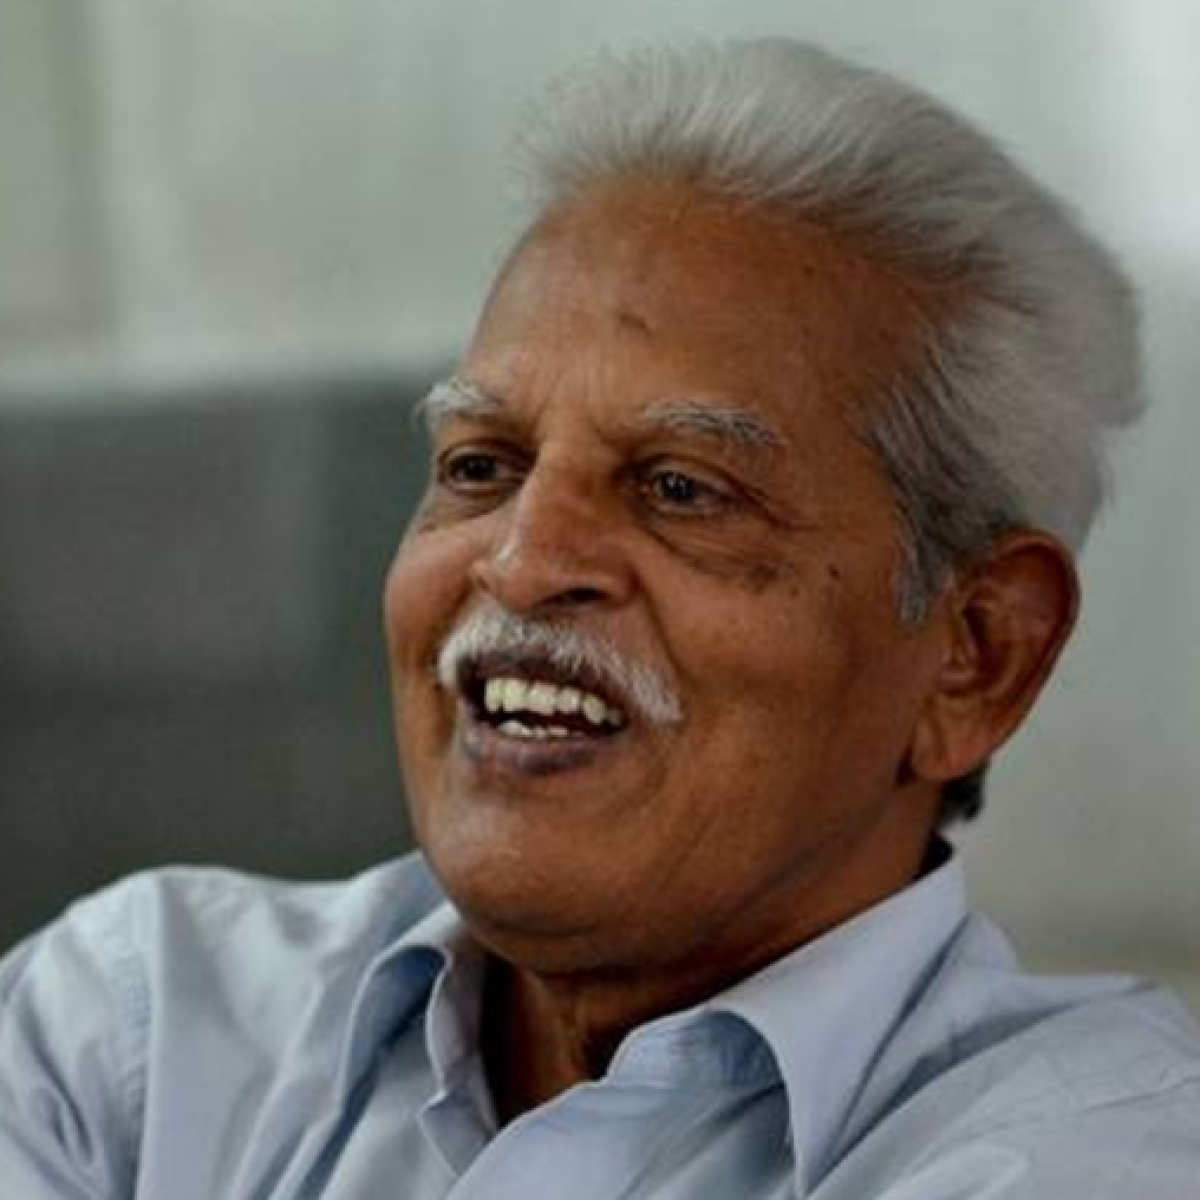 Bhima-Koregaon violence: Varavara Rao's wife appeals to Guv for basic amenities in jail for him